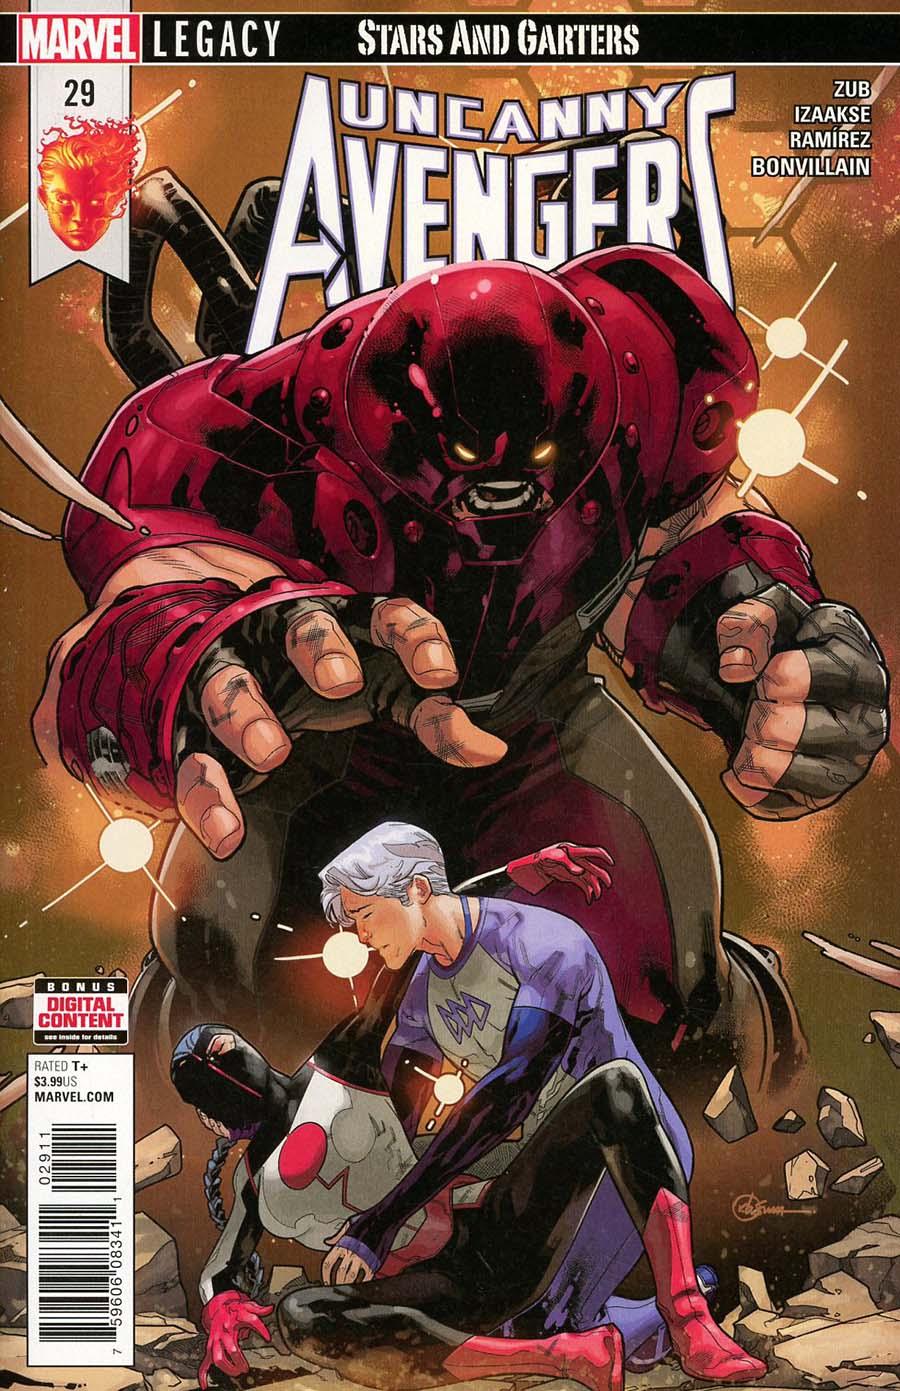 Uncanny Avengers Vol 3 #29 (Marvel Legacy Tie-In)